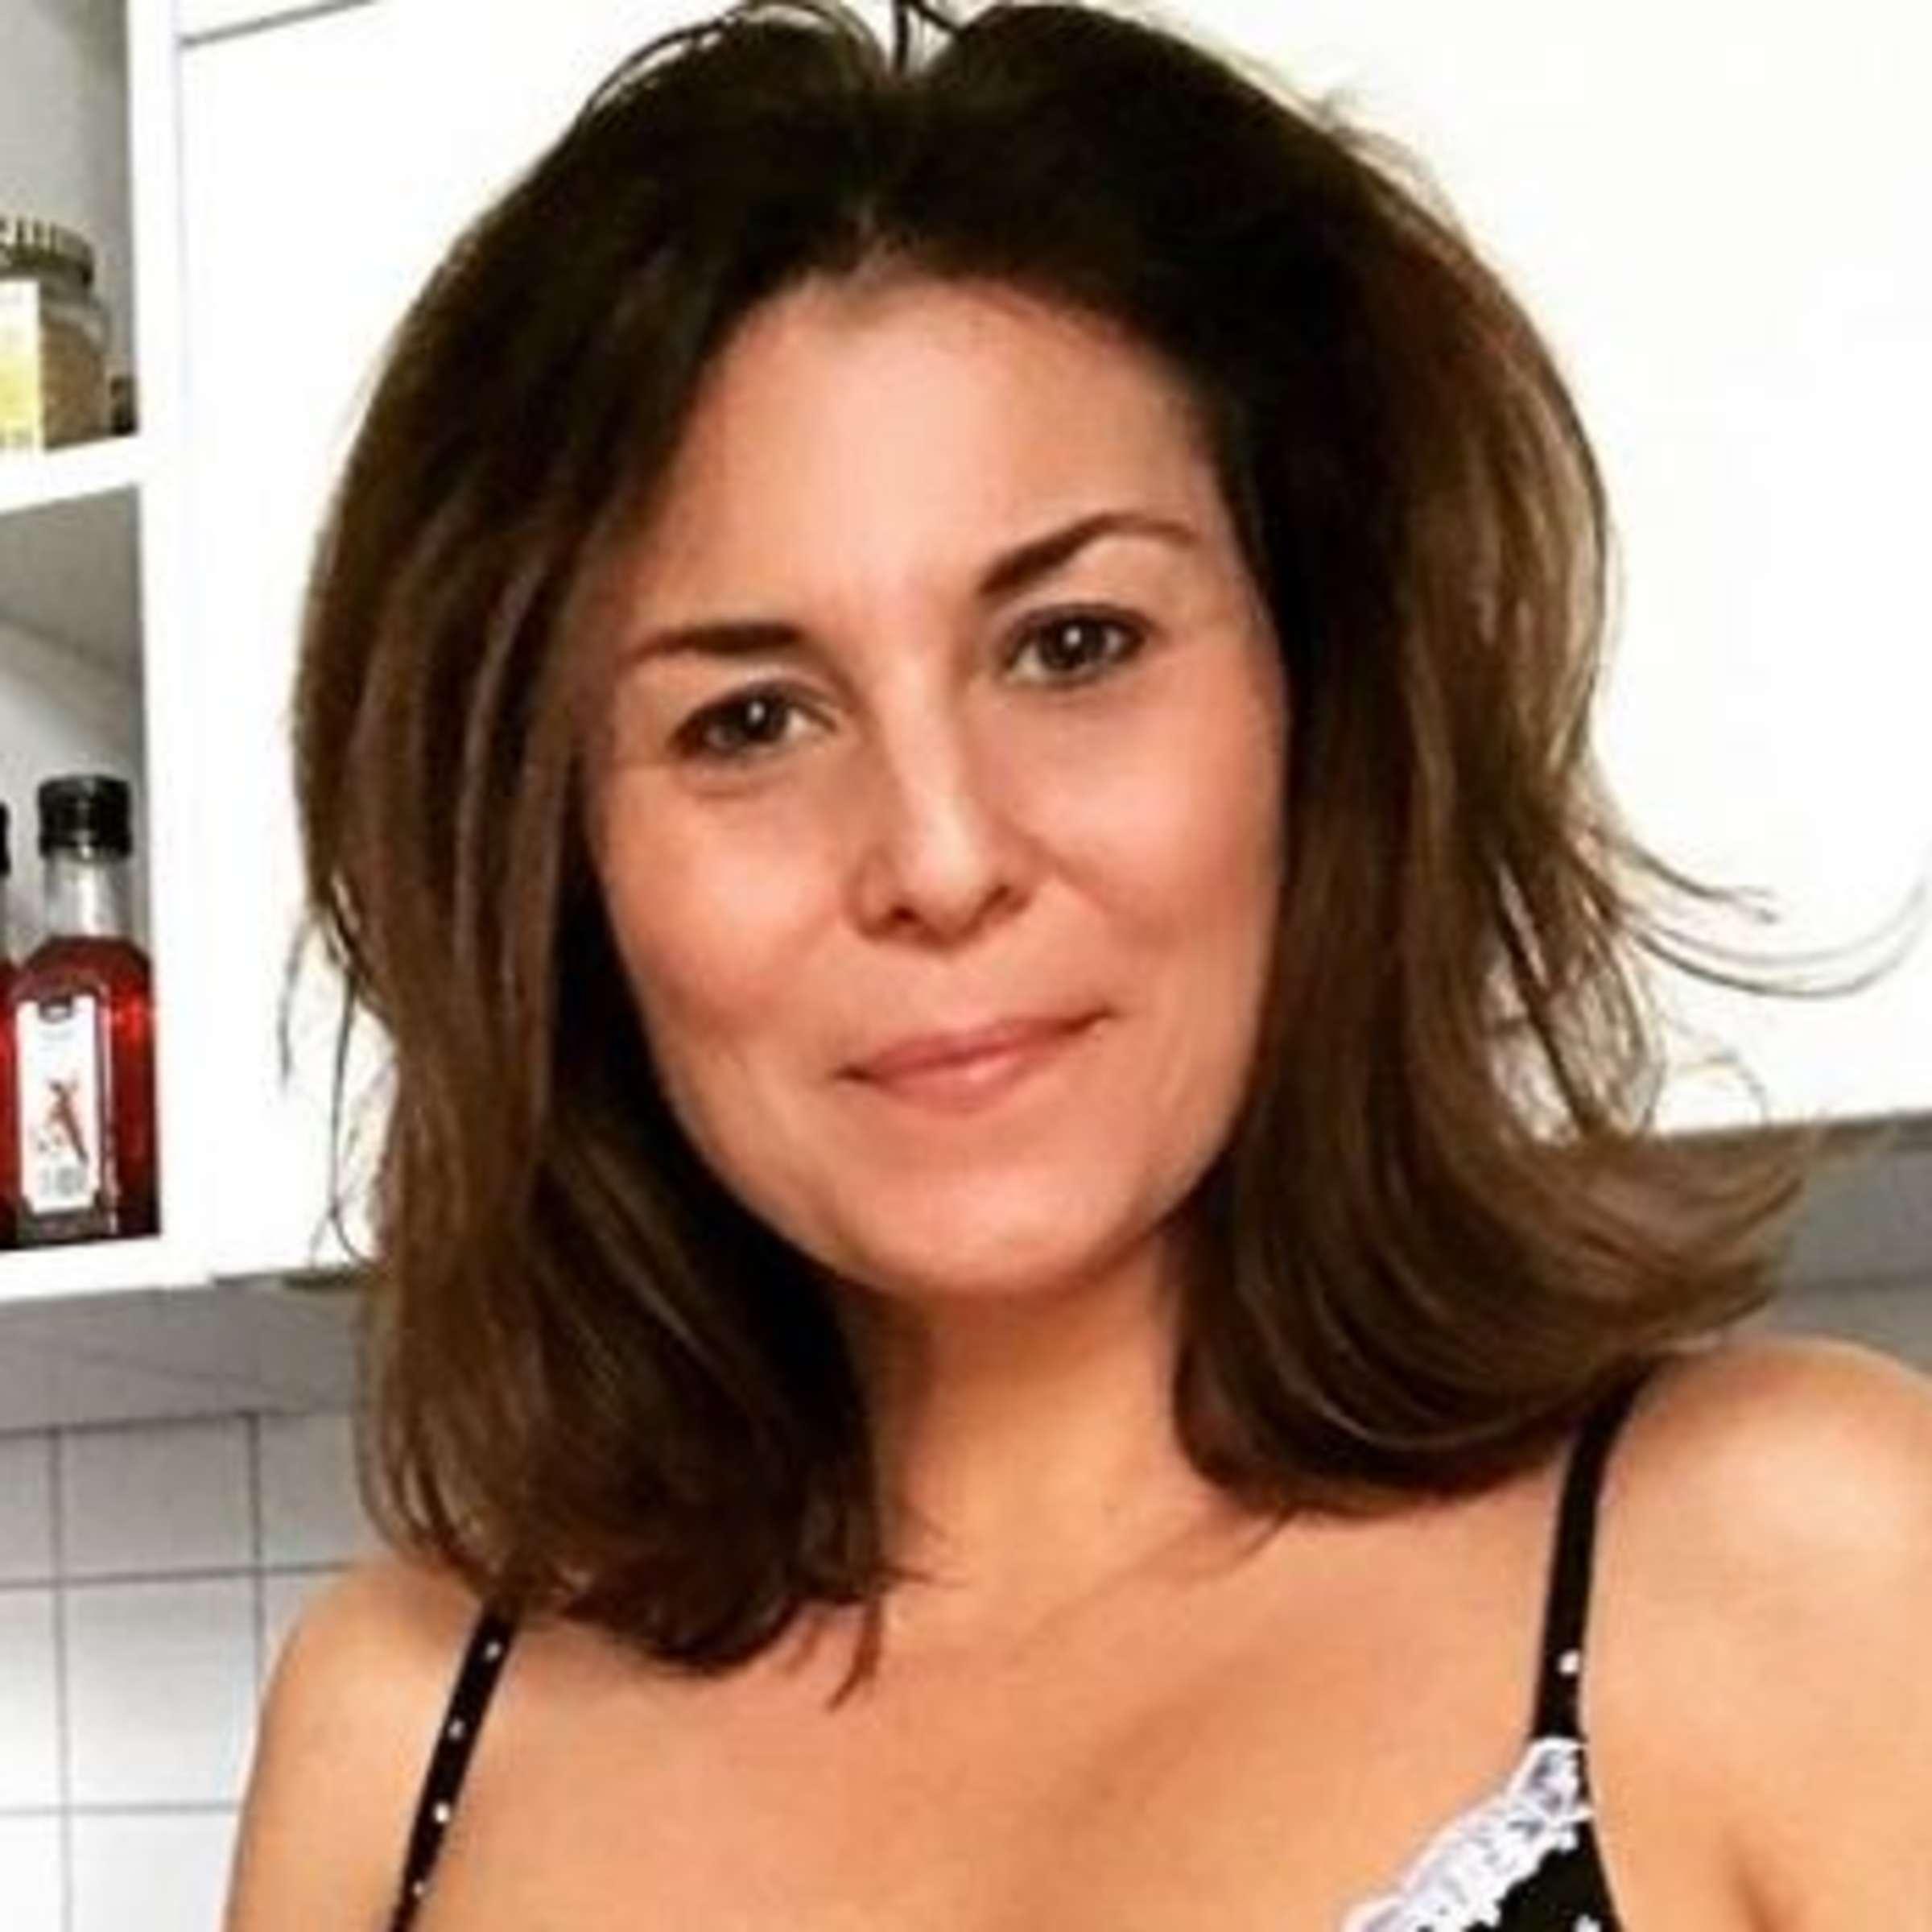 Blumhage nackt vanessa Vanessa Blumhagen